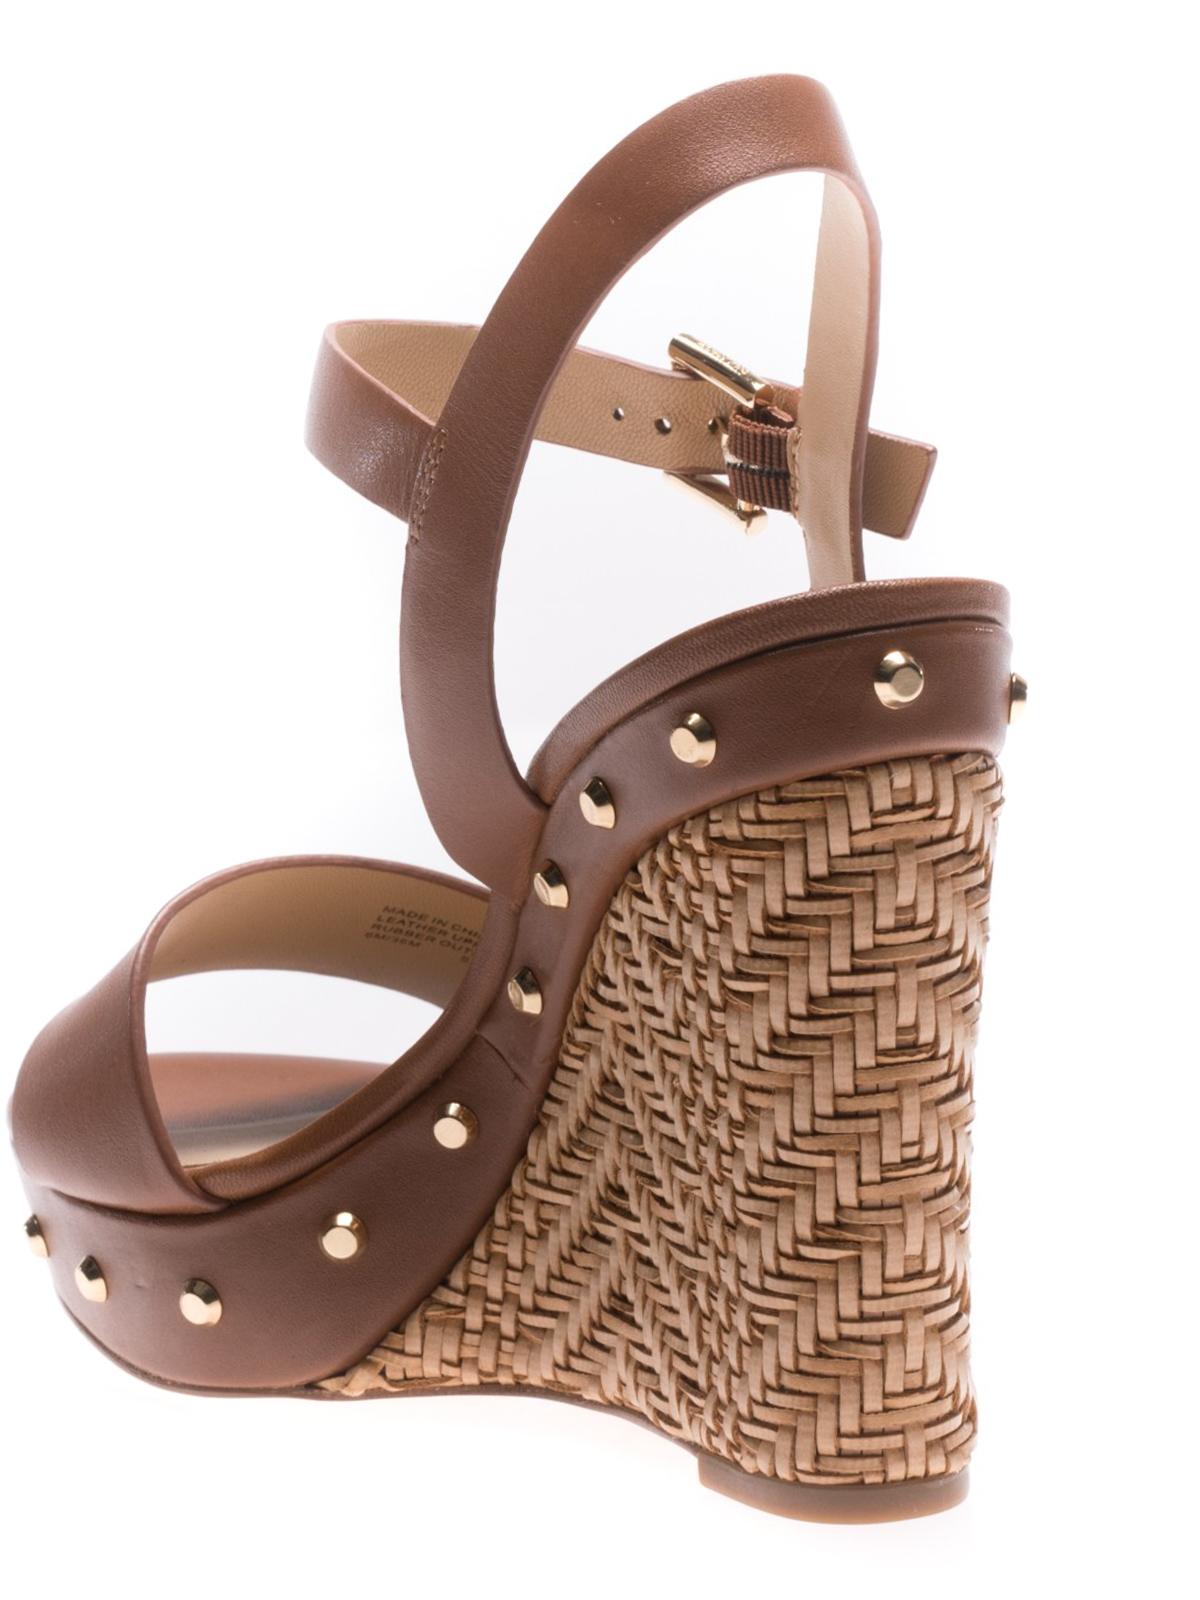 Ellen brown leather wedge sandals